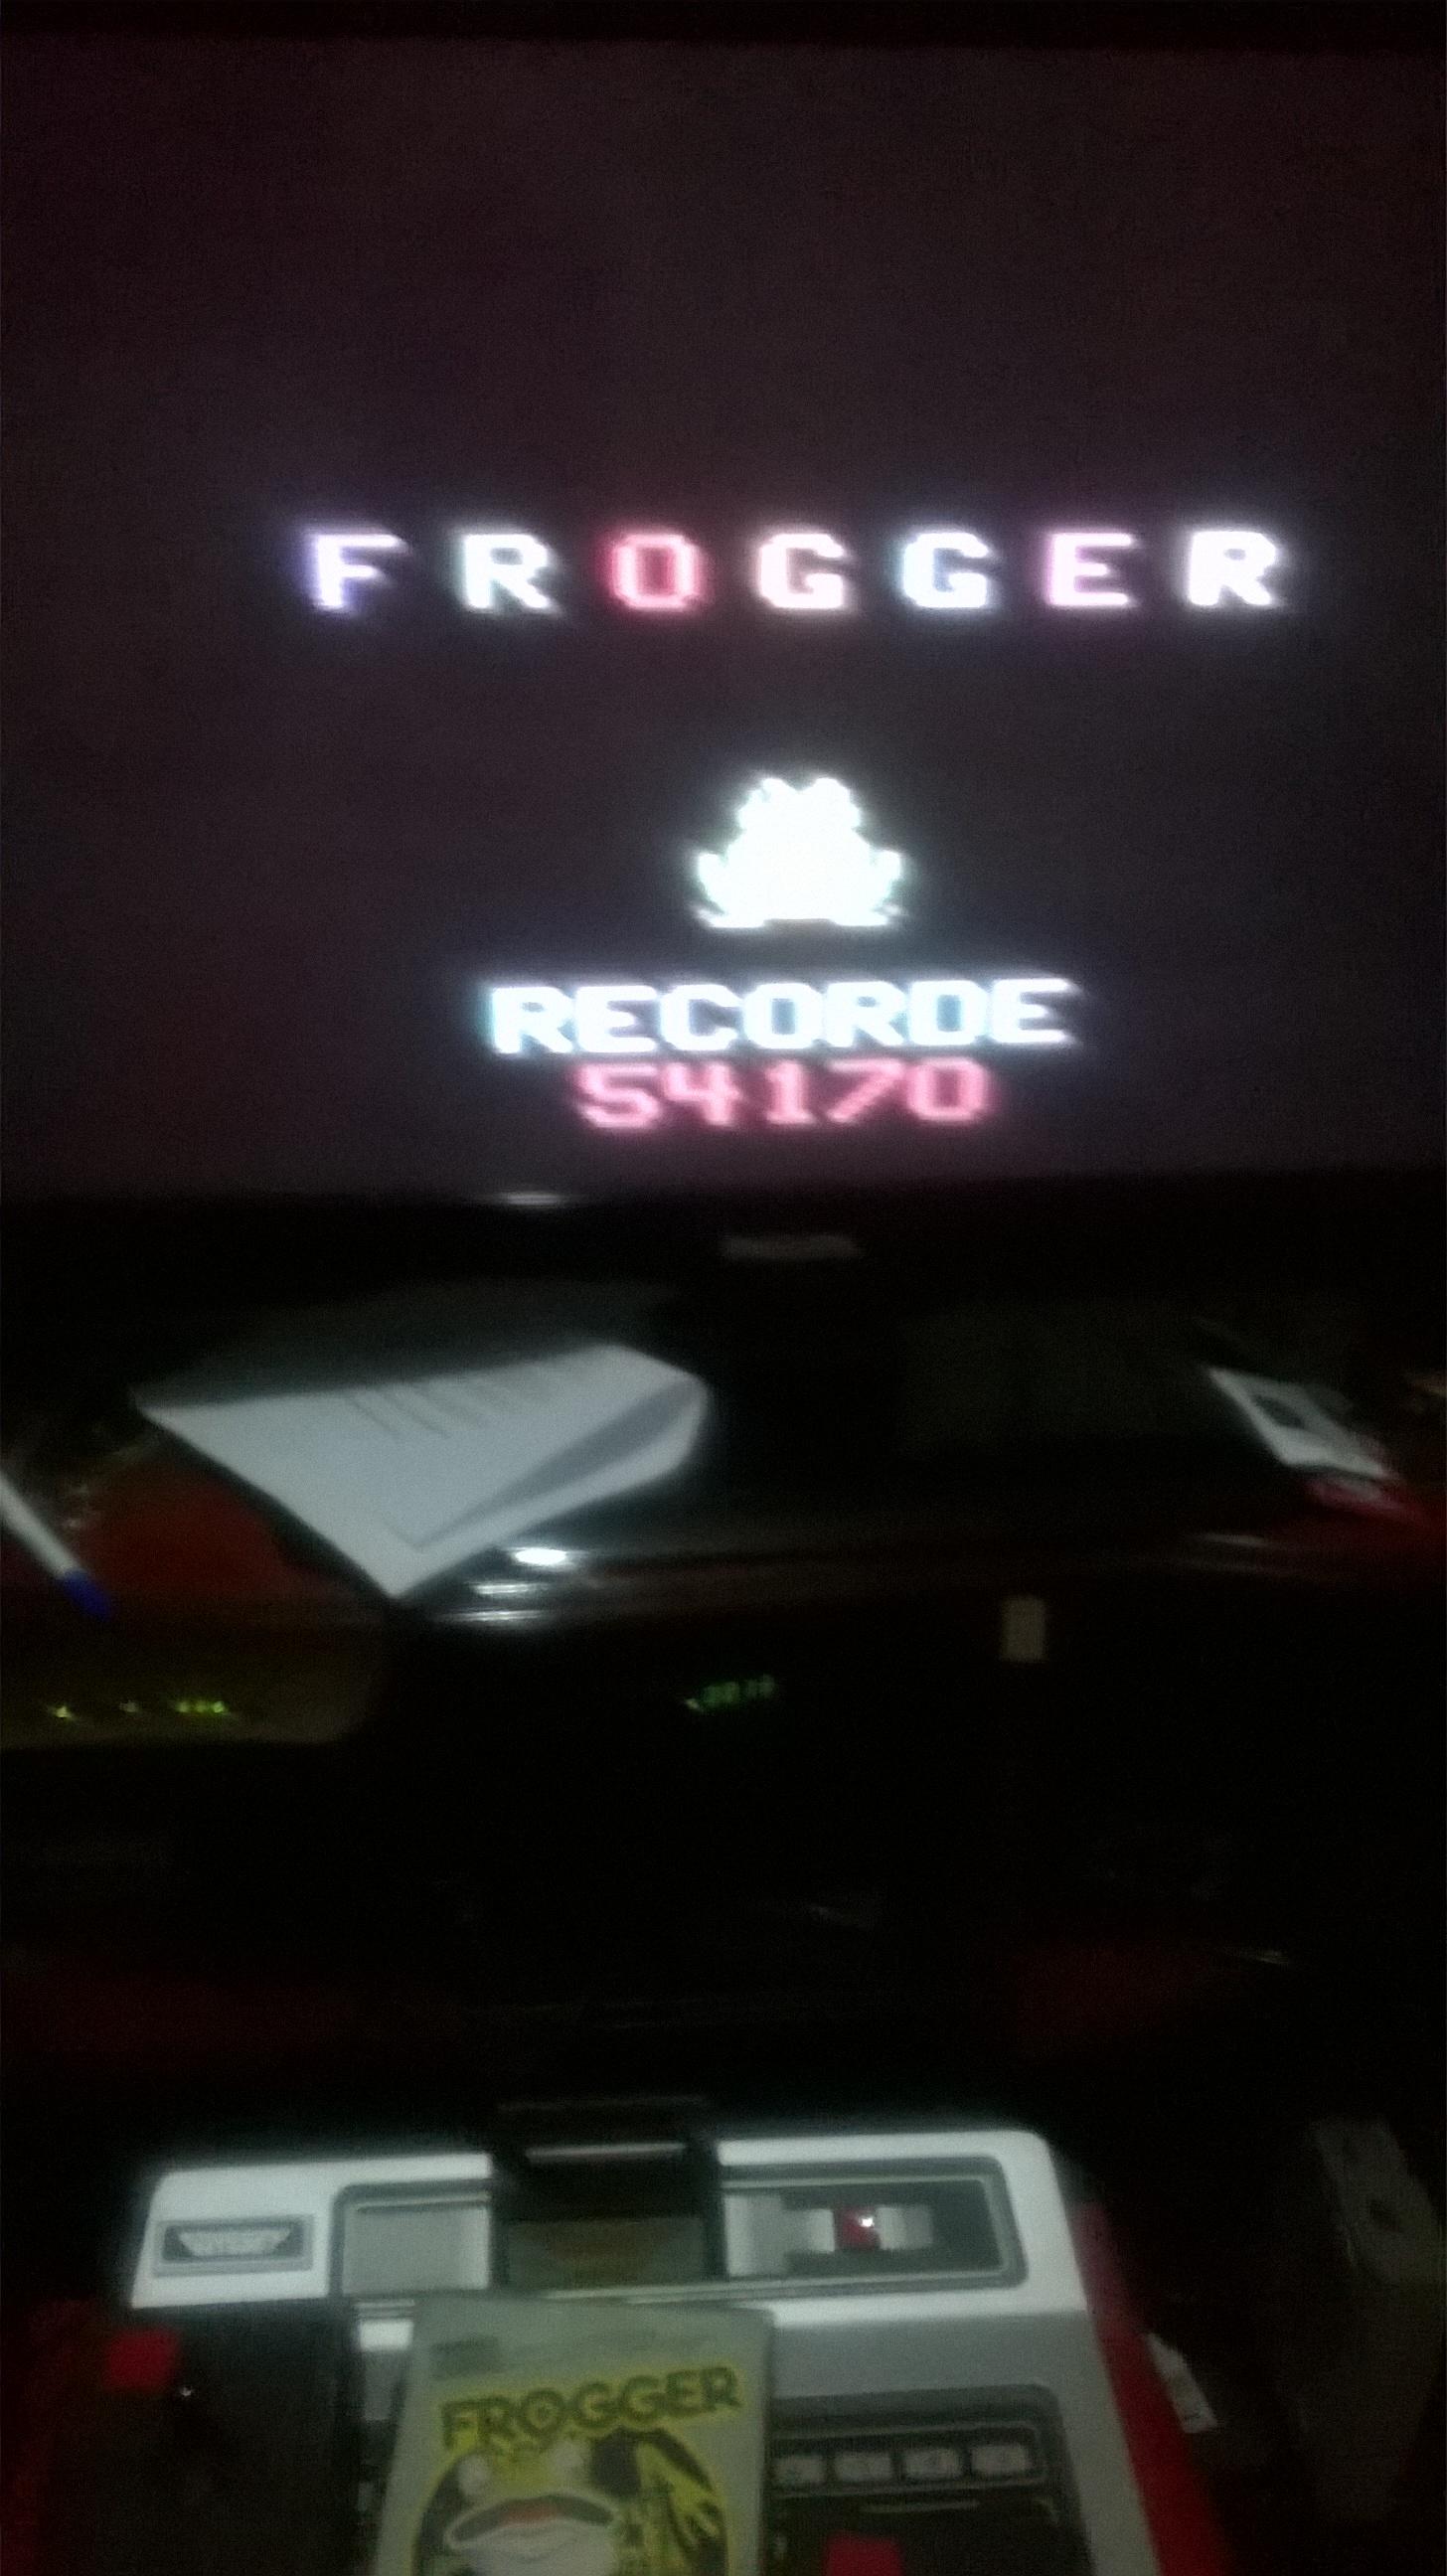 idenir: Frogger (Odyssey 2 / Videopac) 54,170 points on 2017-04-05 17:23:06